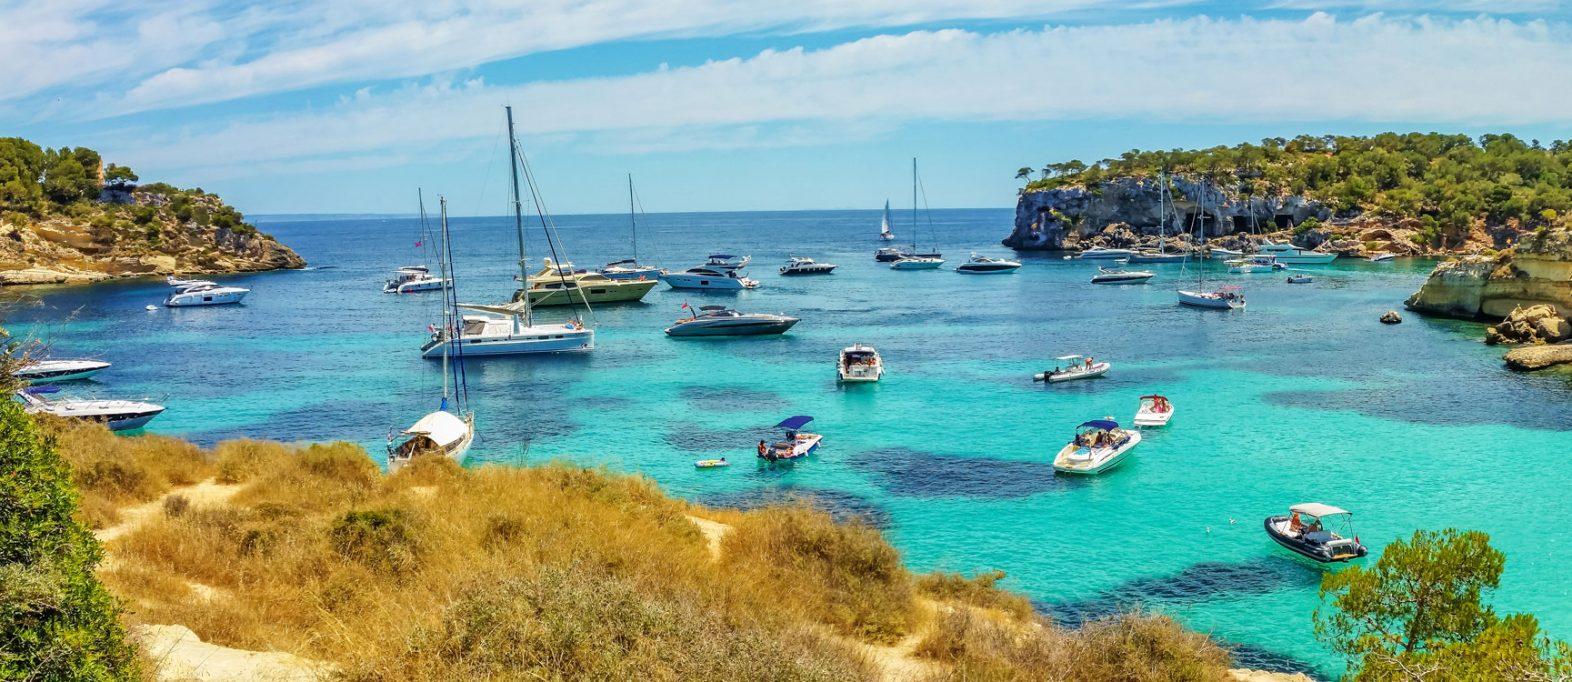 Mallorca Spanien (Adobe Stock ID:175759204)